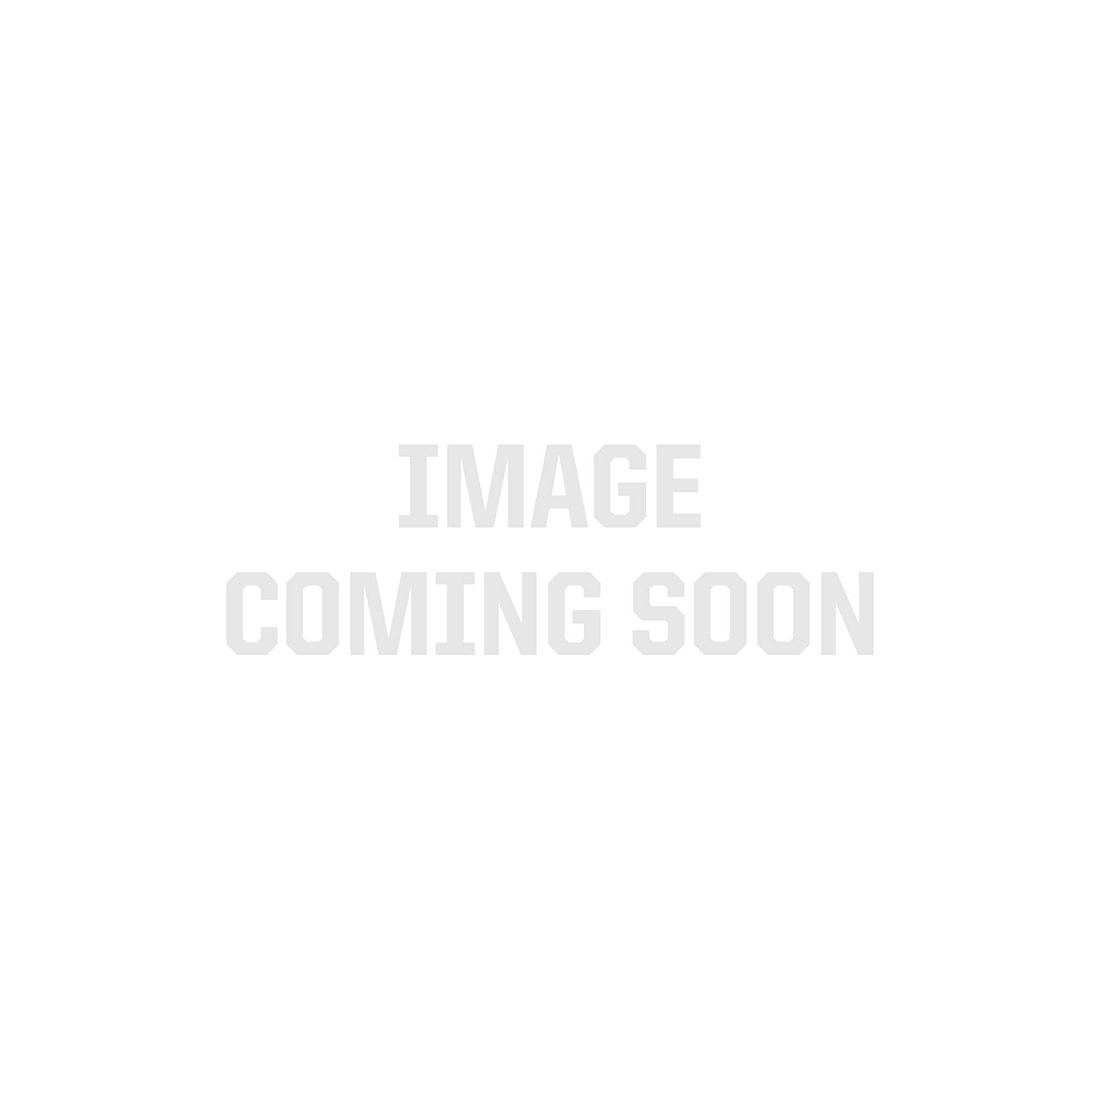 Universal Dimming Driver - 24 VDC - 96W